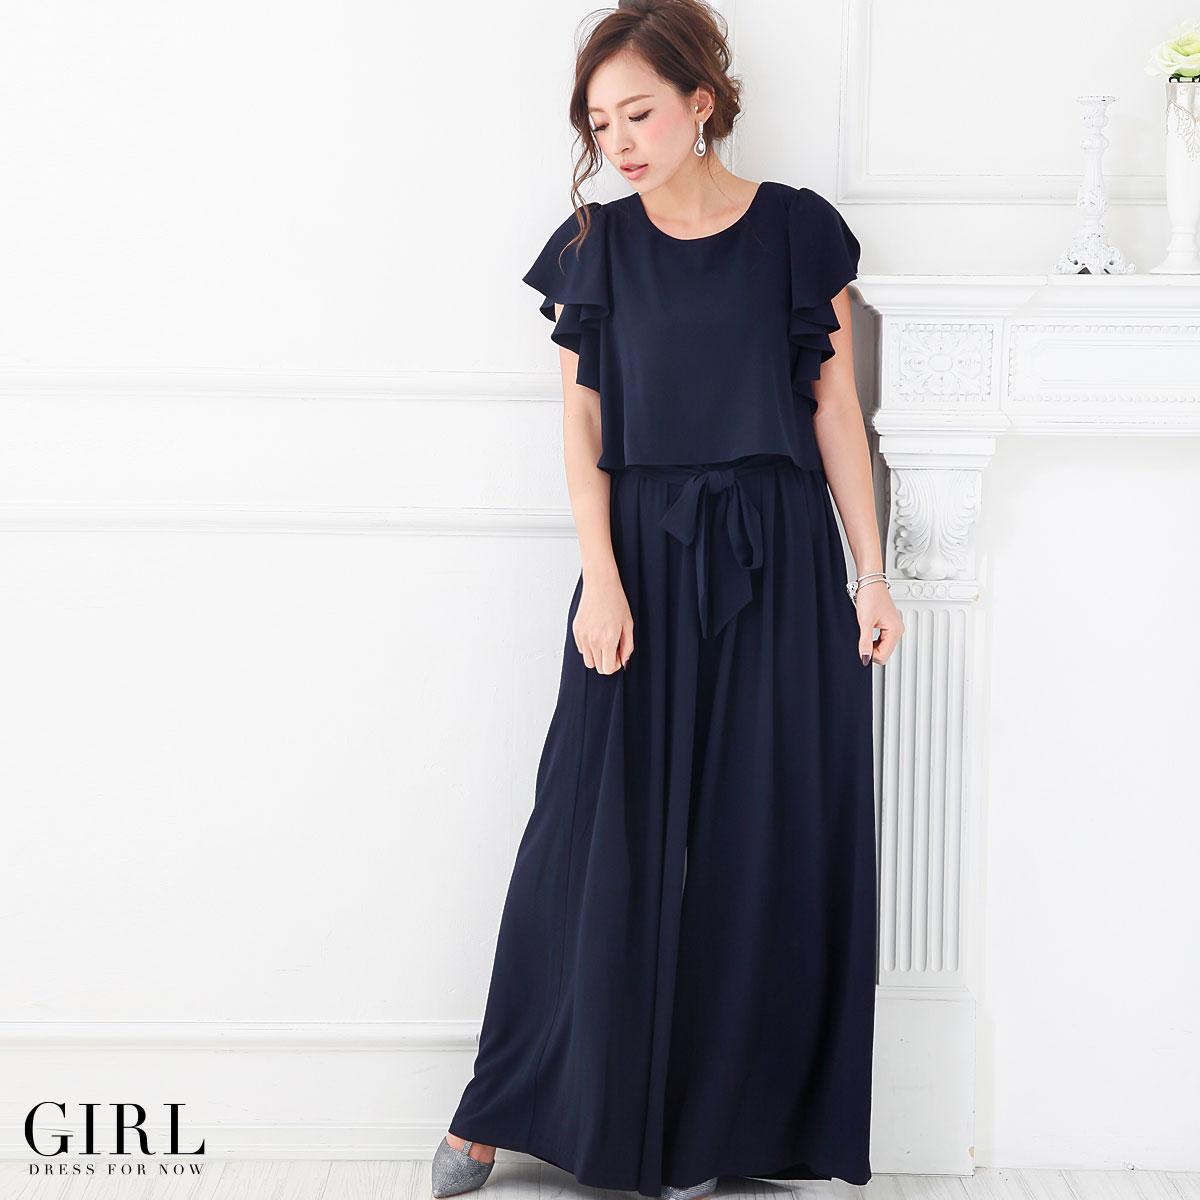 Dress Shop GIRL: Party Dress Pantdress Dress Wedding